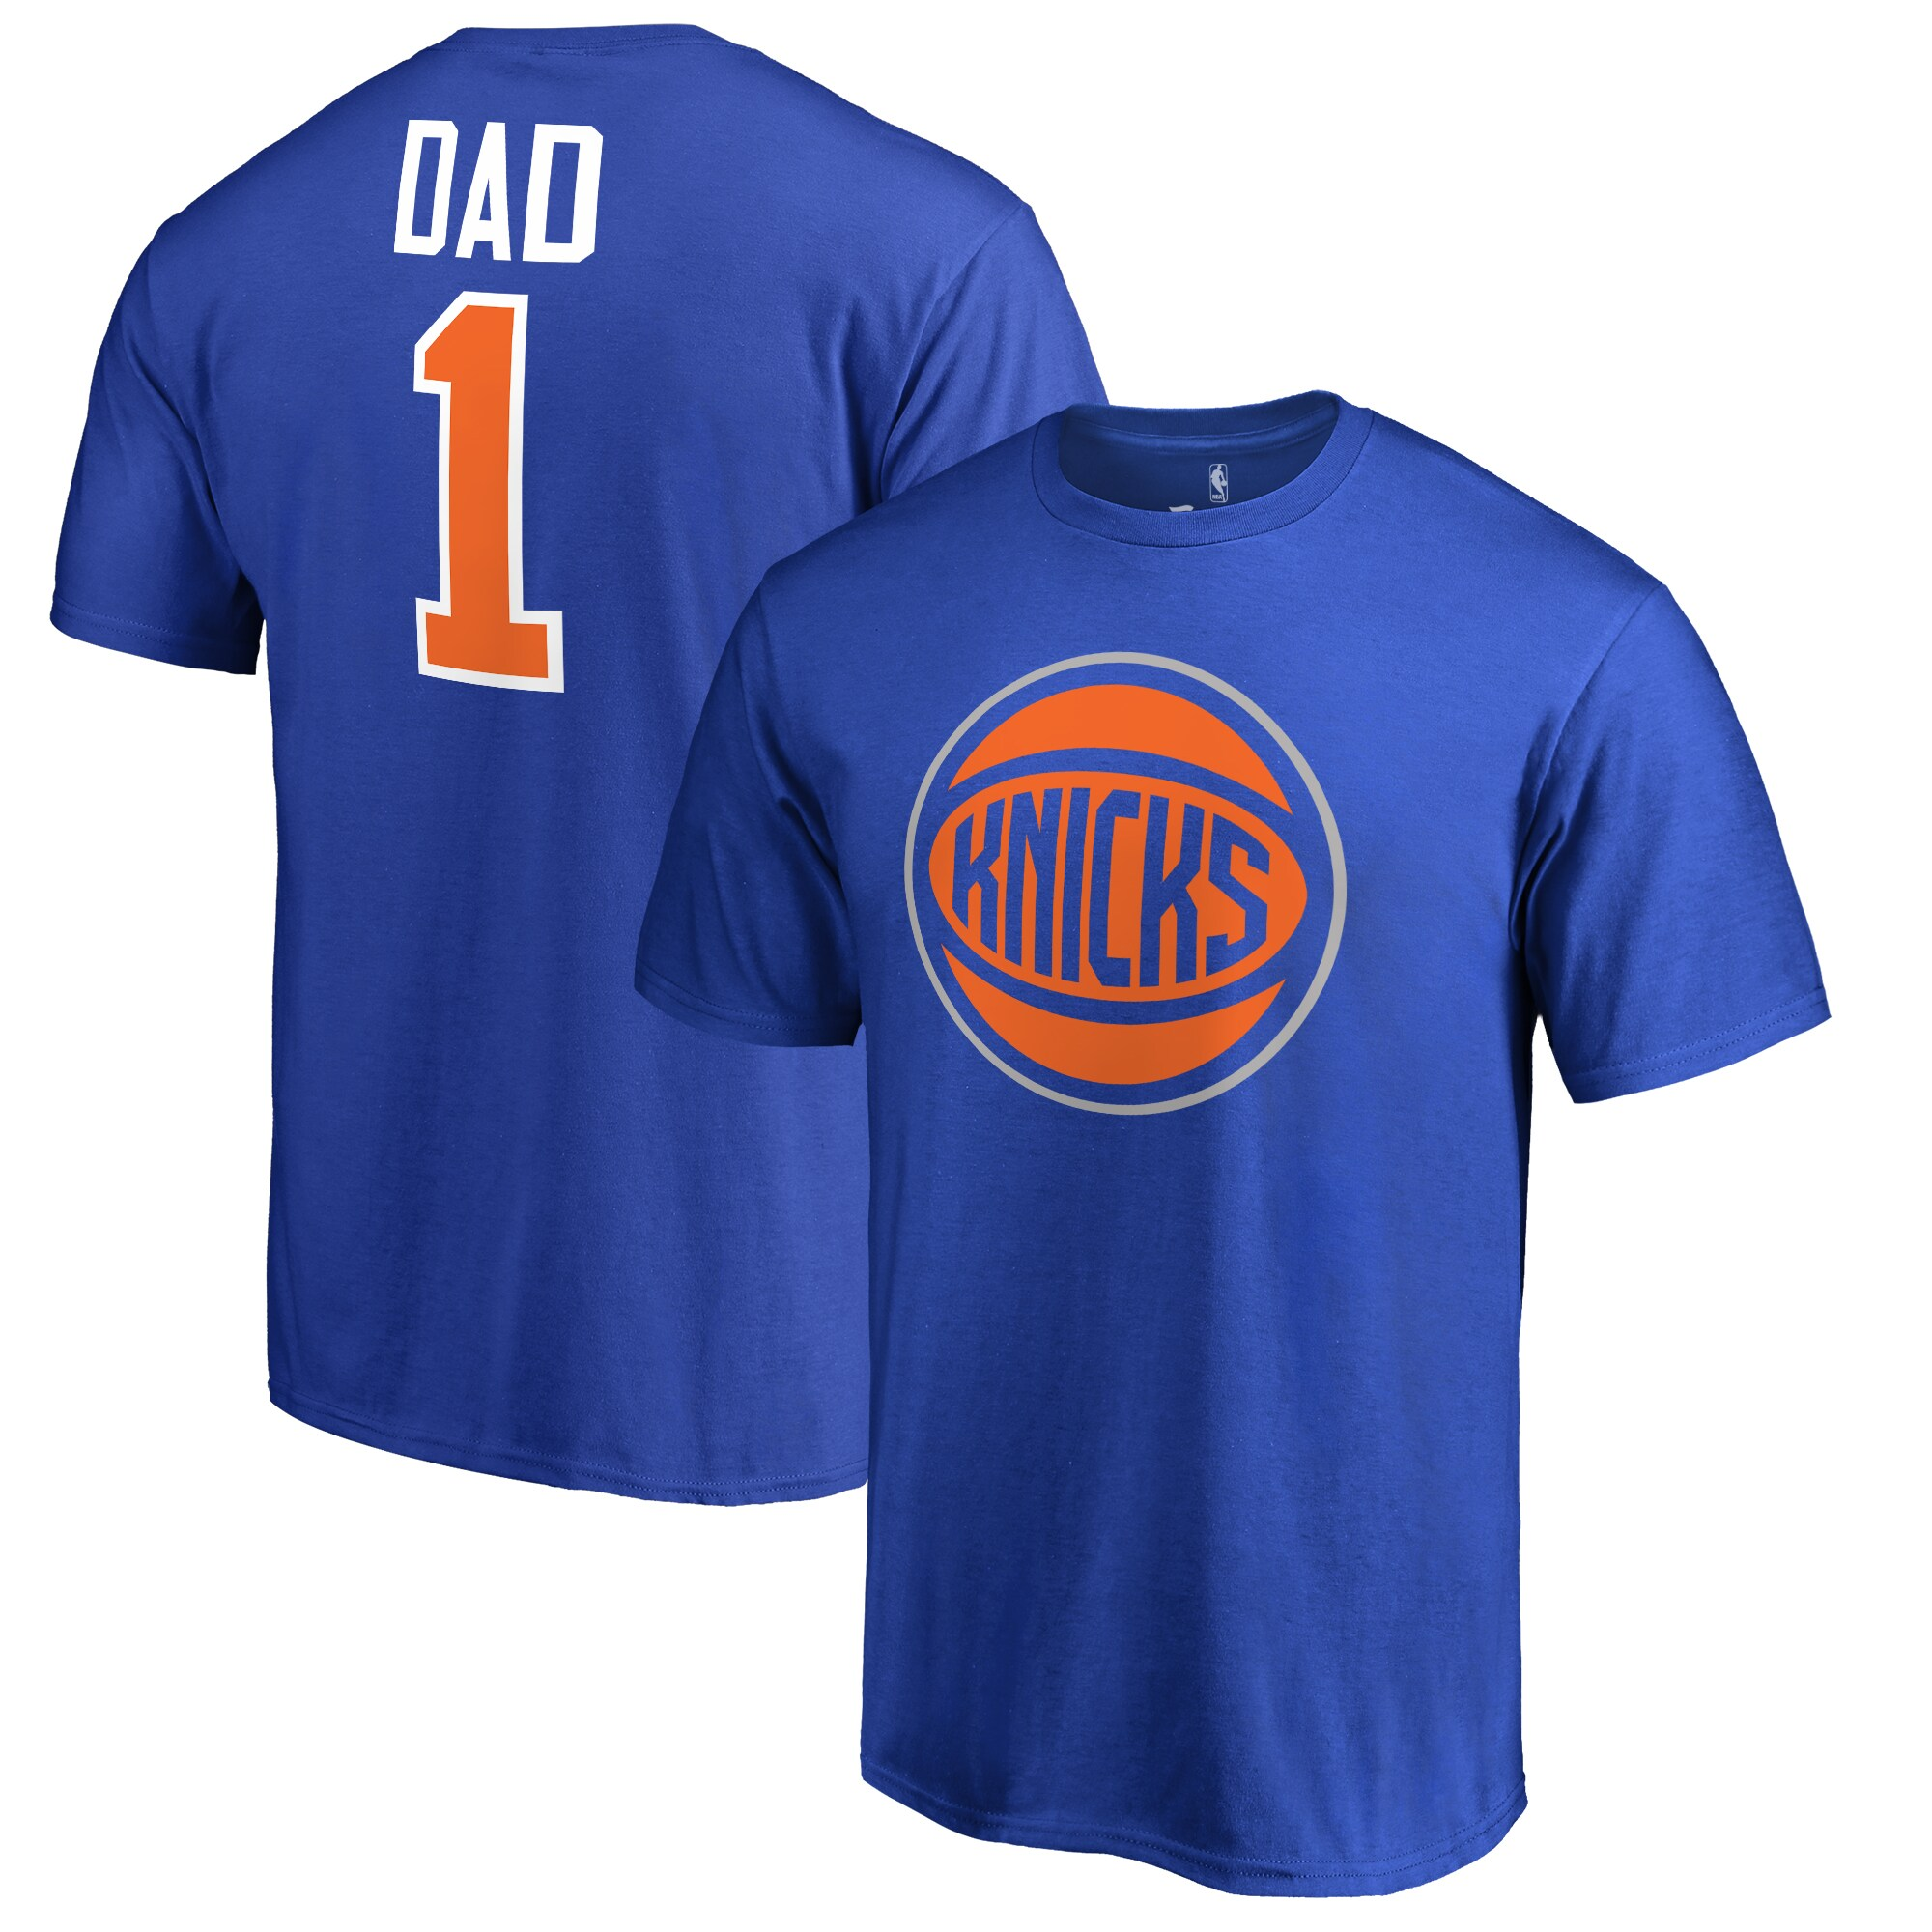 New York Knicks #1 Dad T-Shirt - Royal